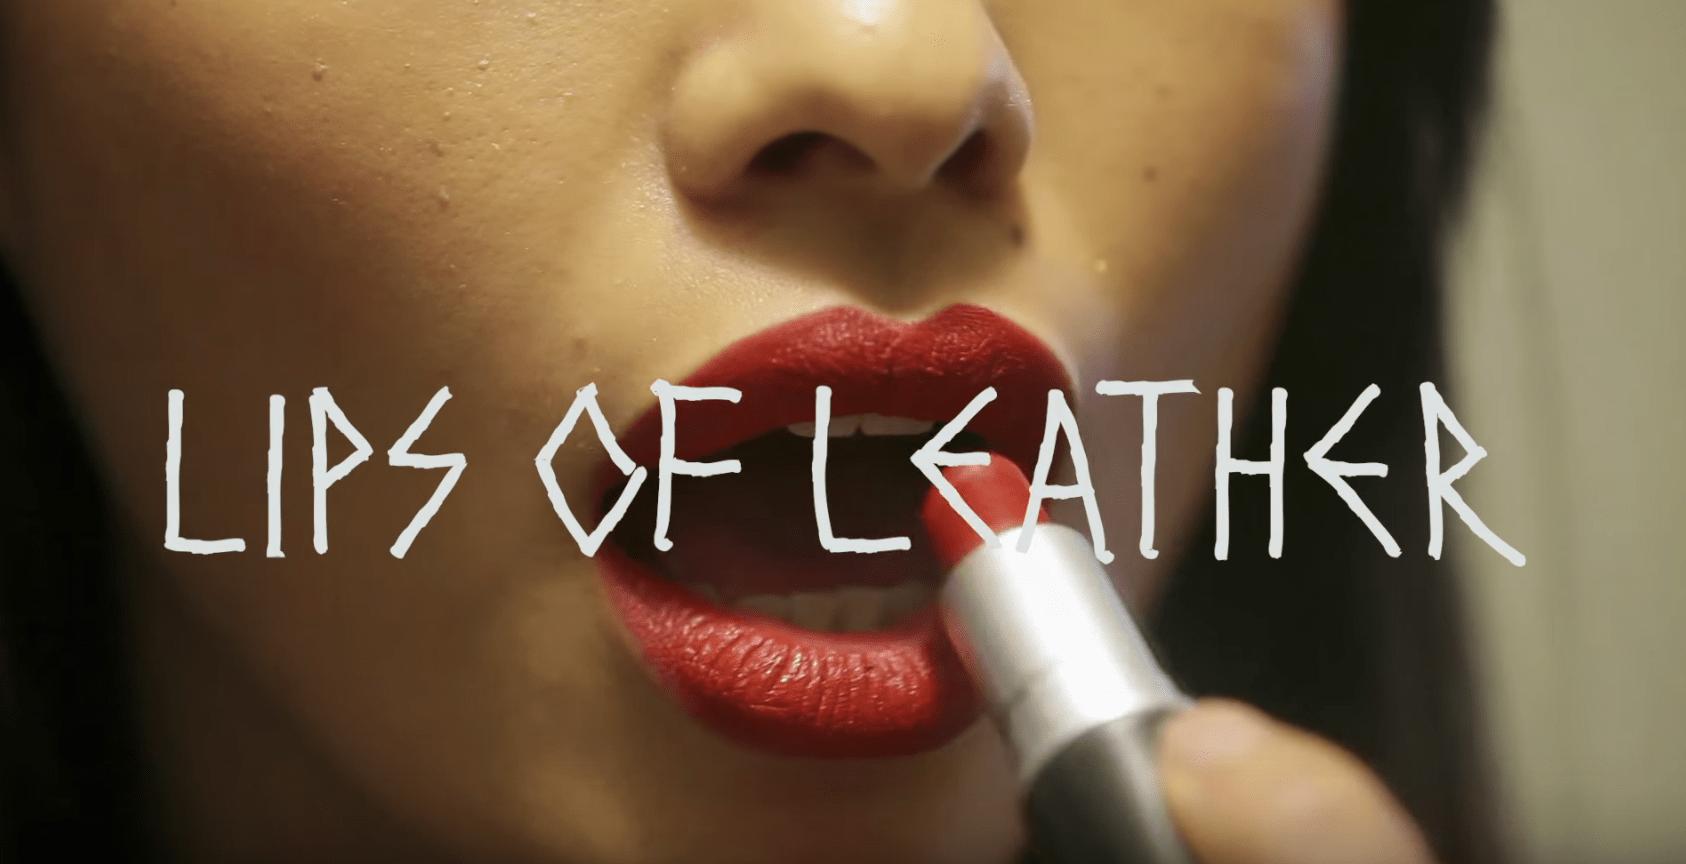 Dark Heavens Lips of Leather